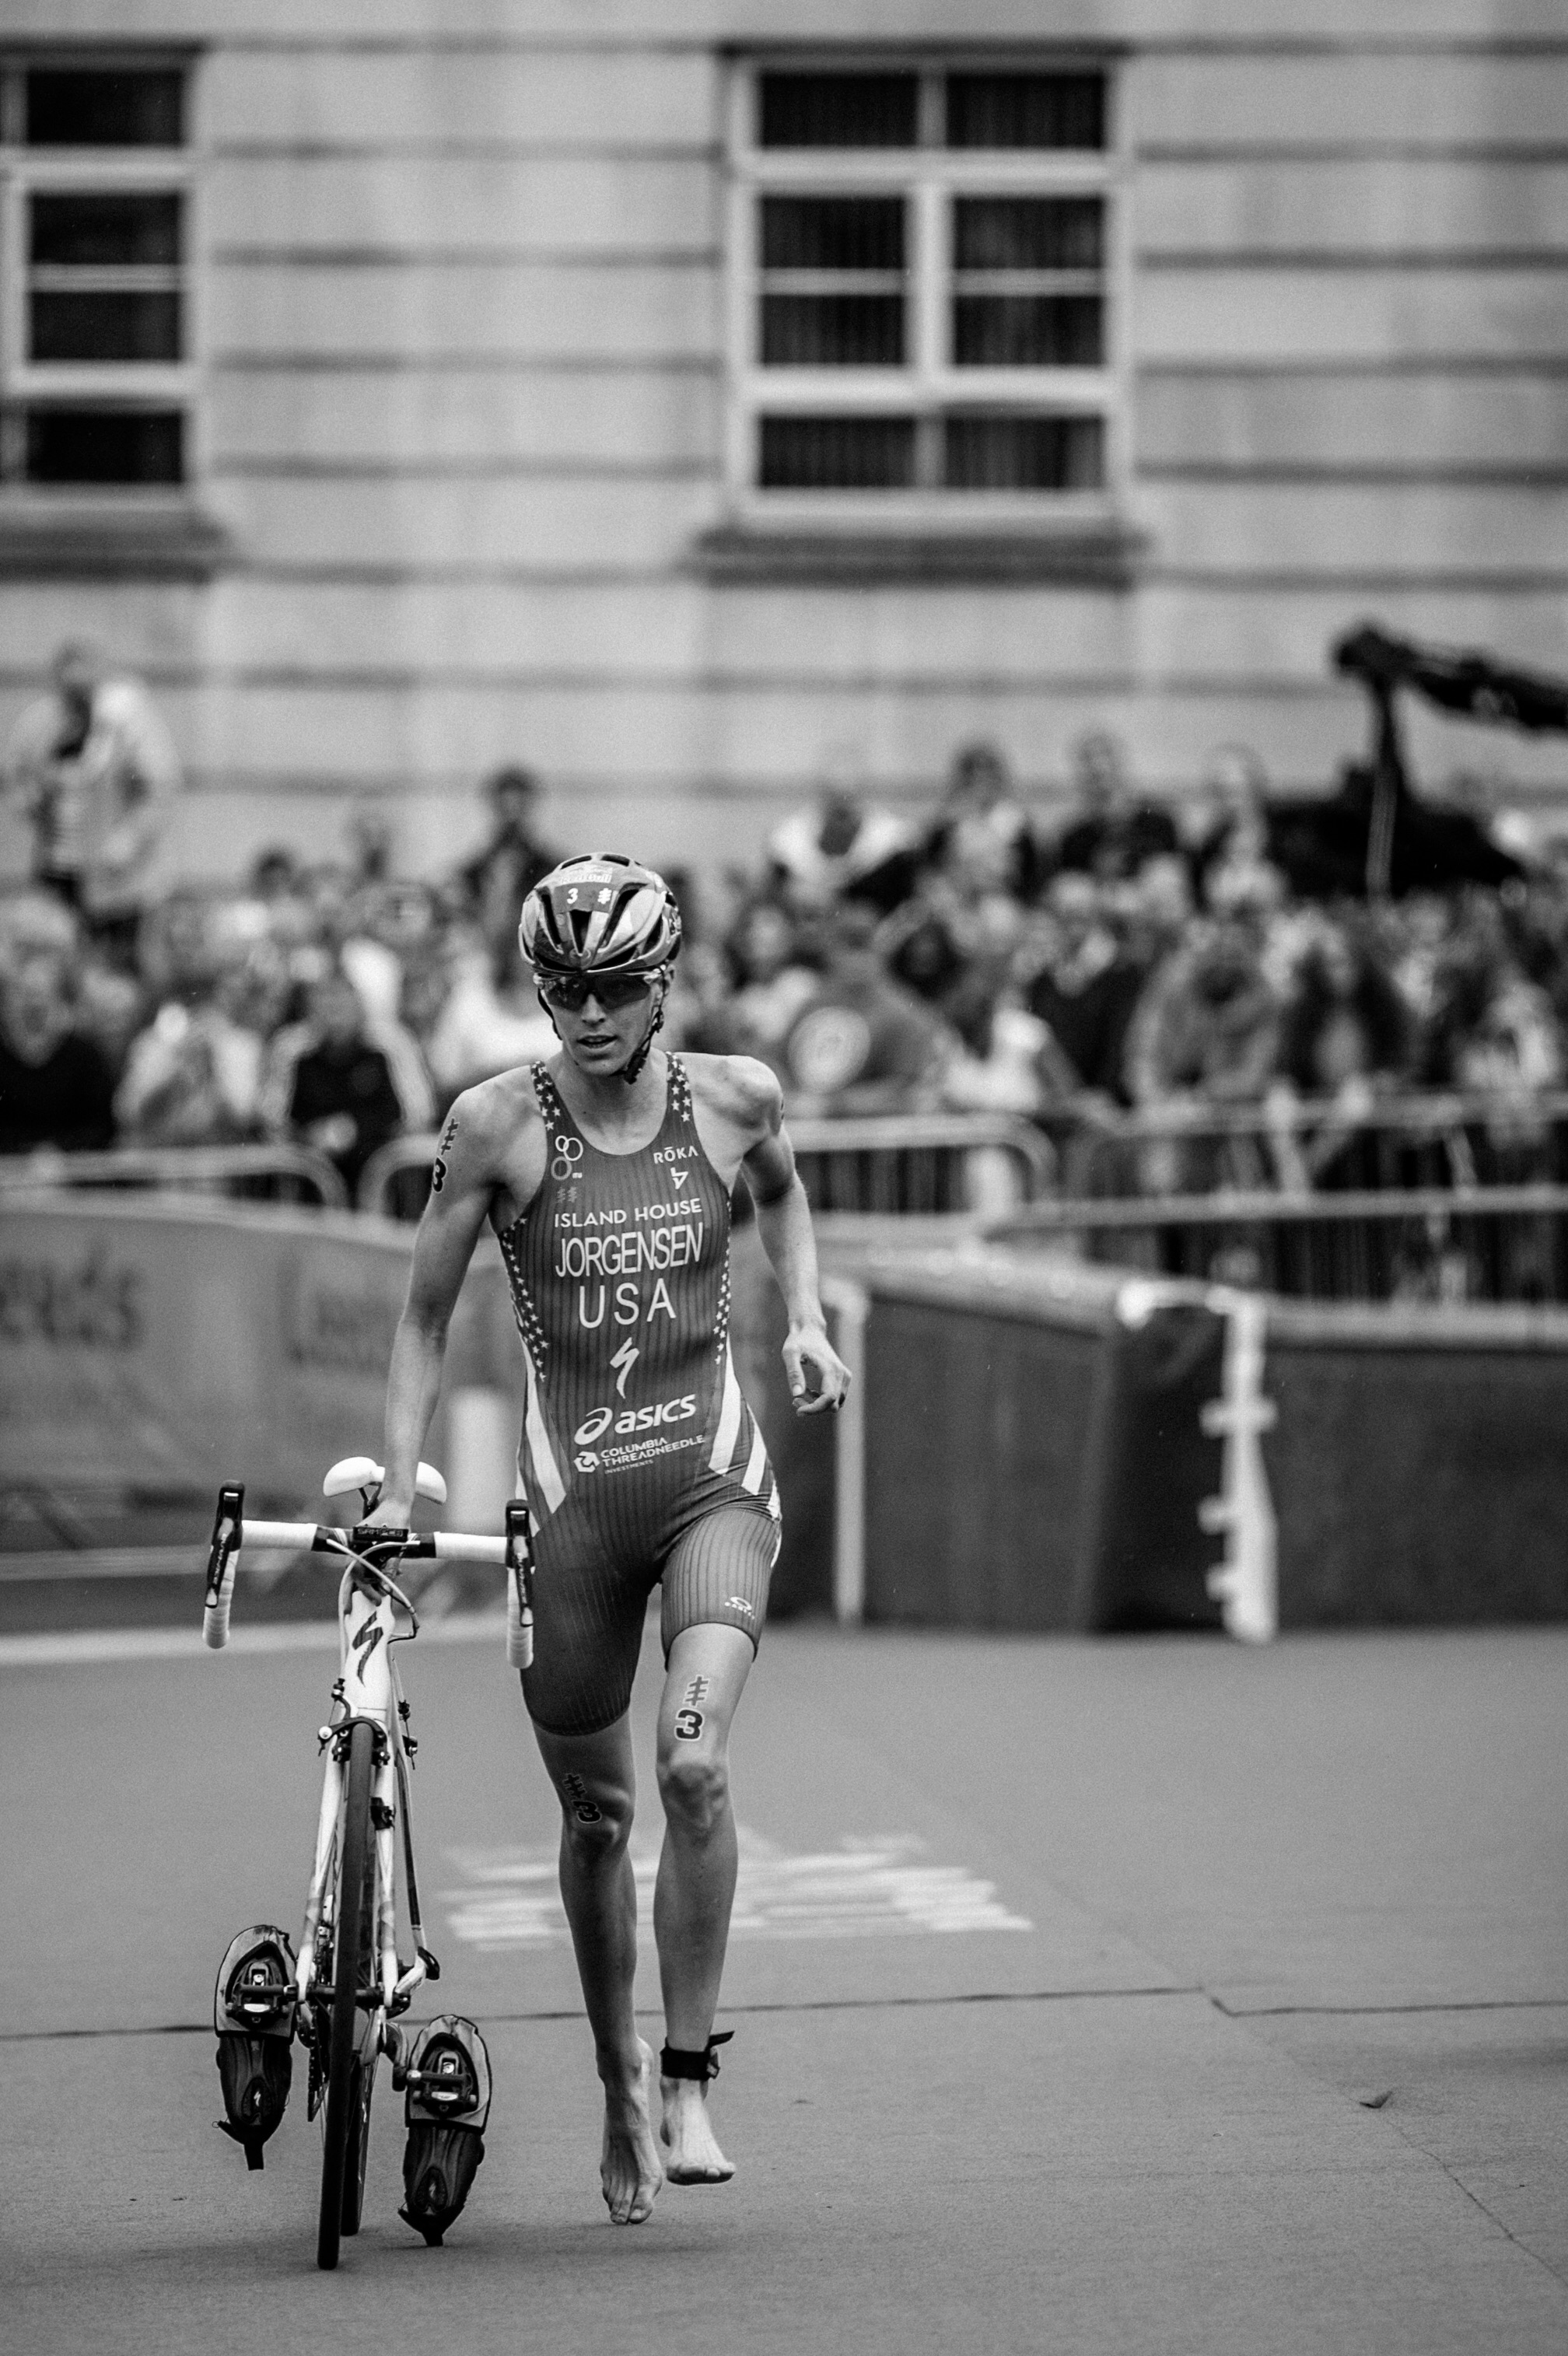 Photo taken by Russ Ellis, @cyclingimages